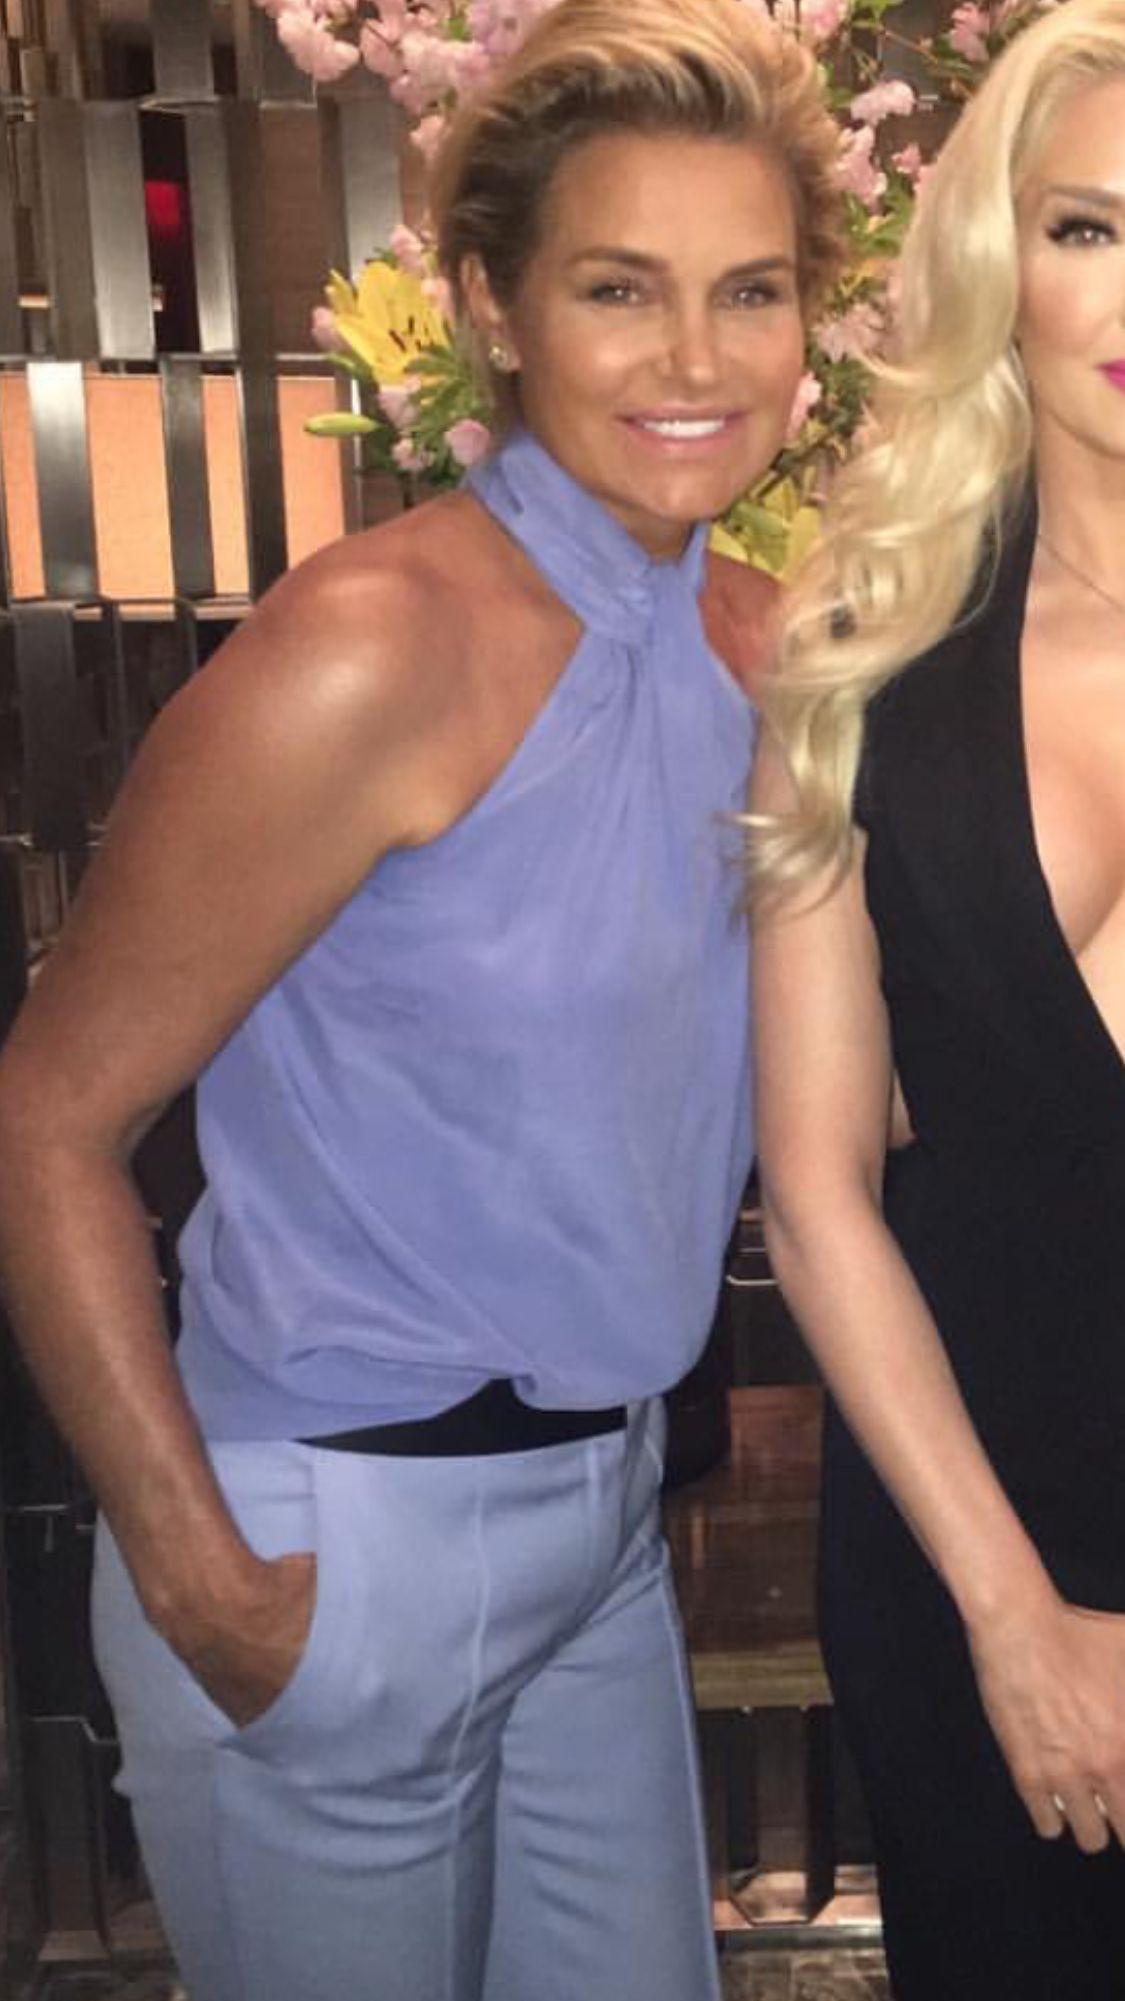 Yolanda Yolanda Hadid Yolanda Foster Hair The Fosters